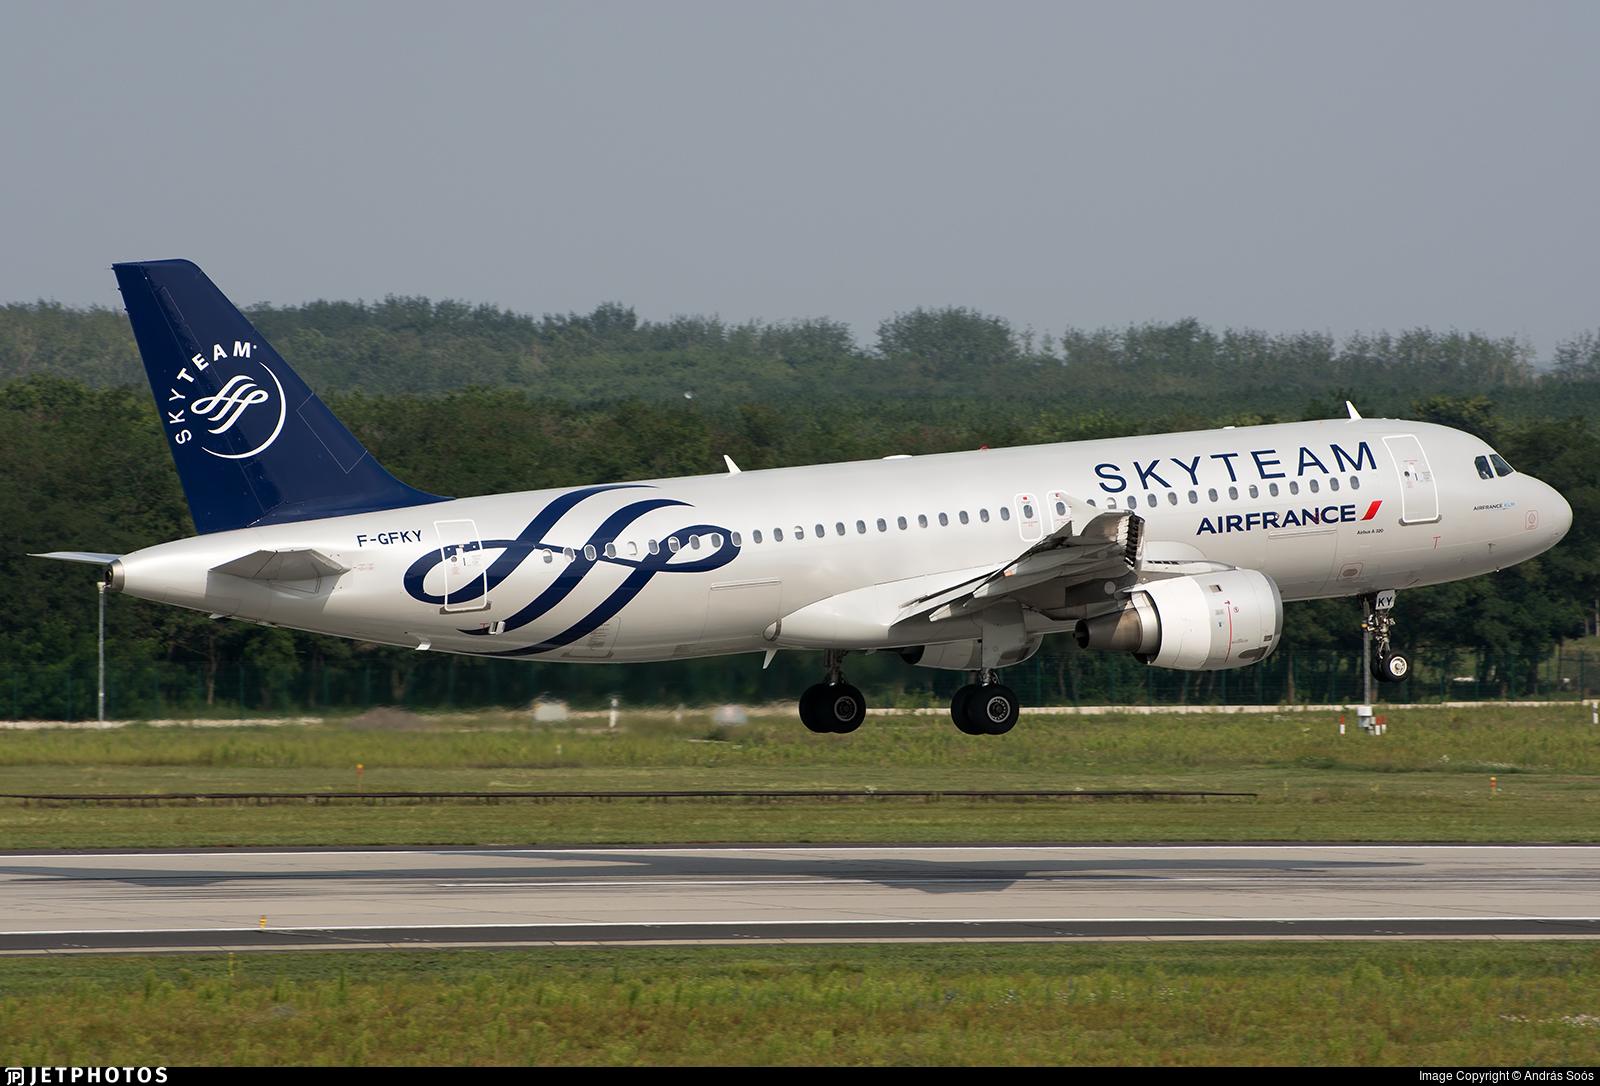 F-GFKY - Airbus A320-211 - Air France